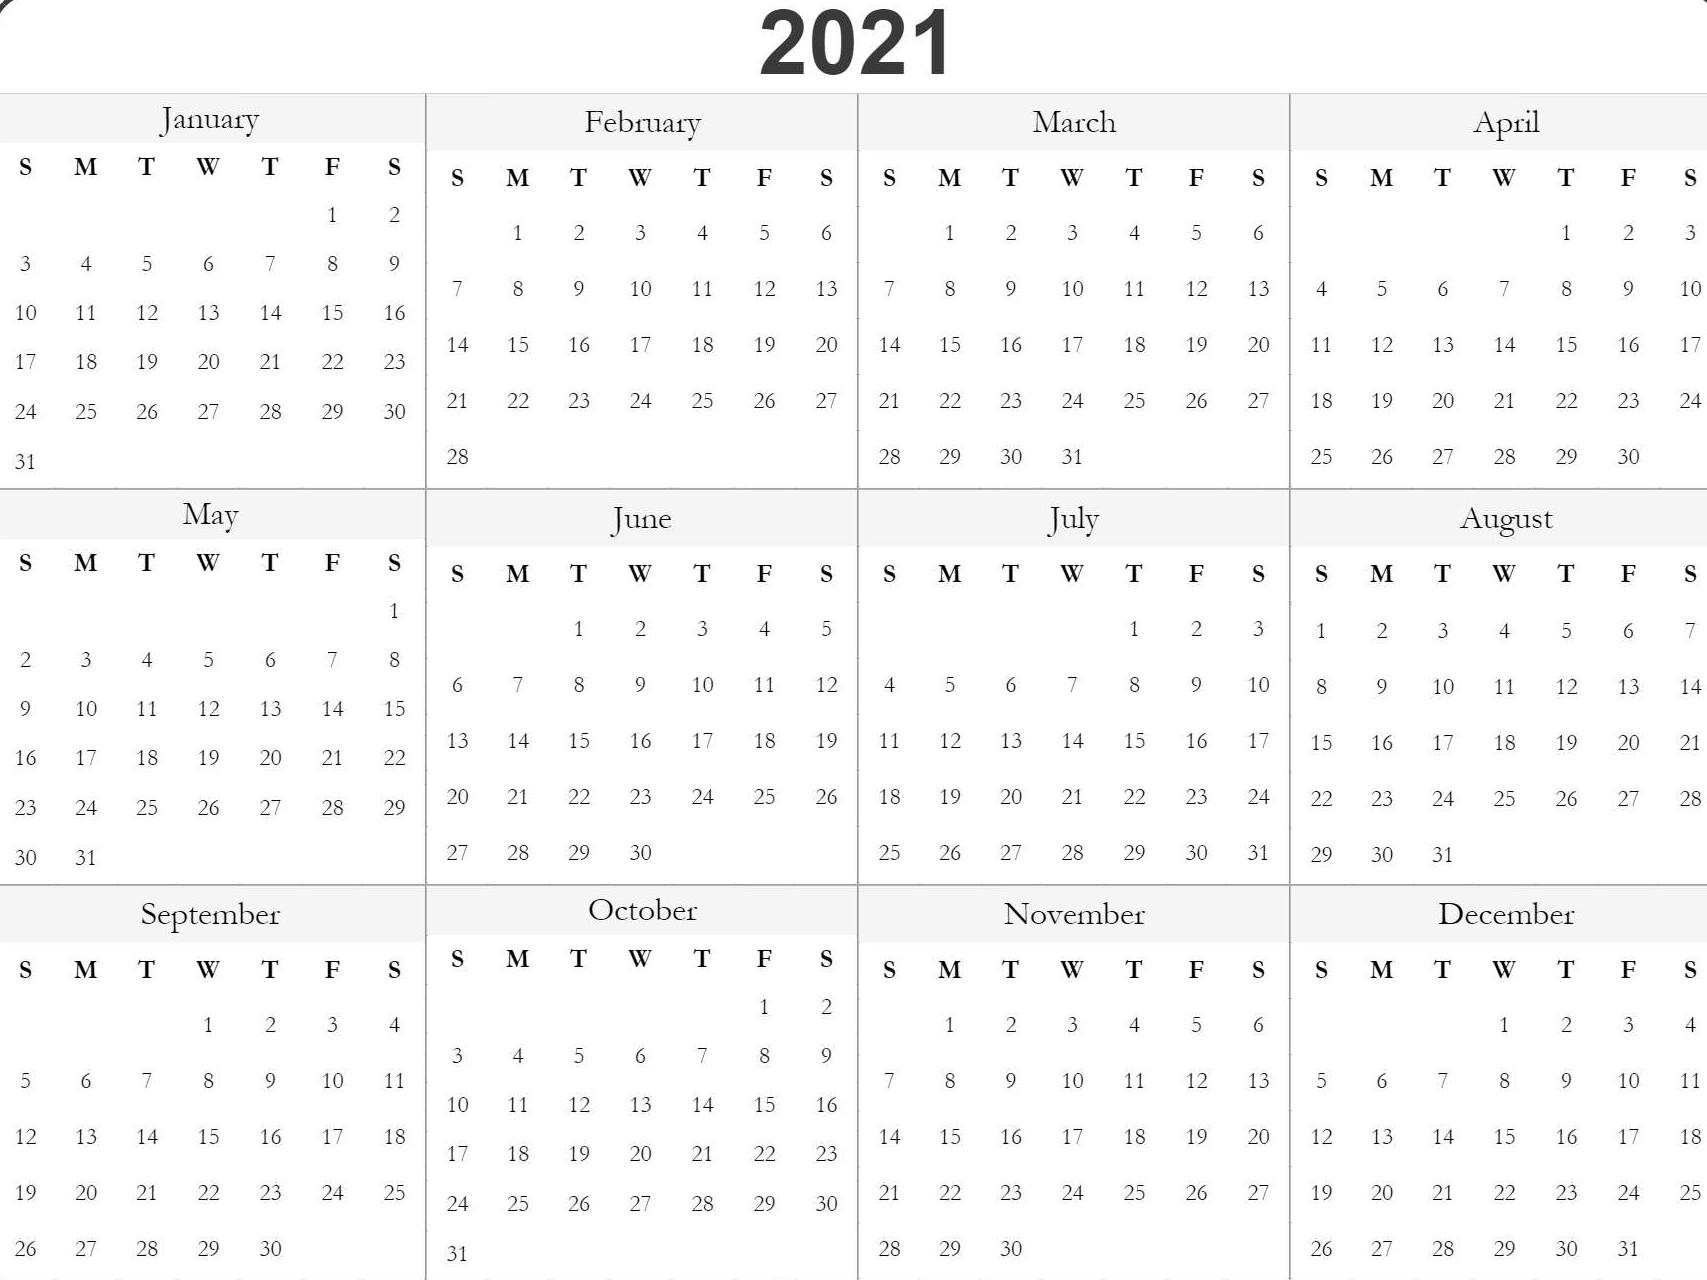 Print 2019 2020 2021 2022 2023 Calender   Calendar-Printable Bill Calendar 2021